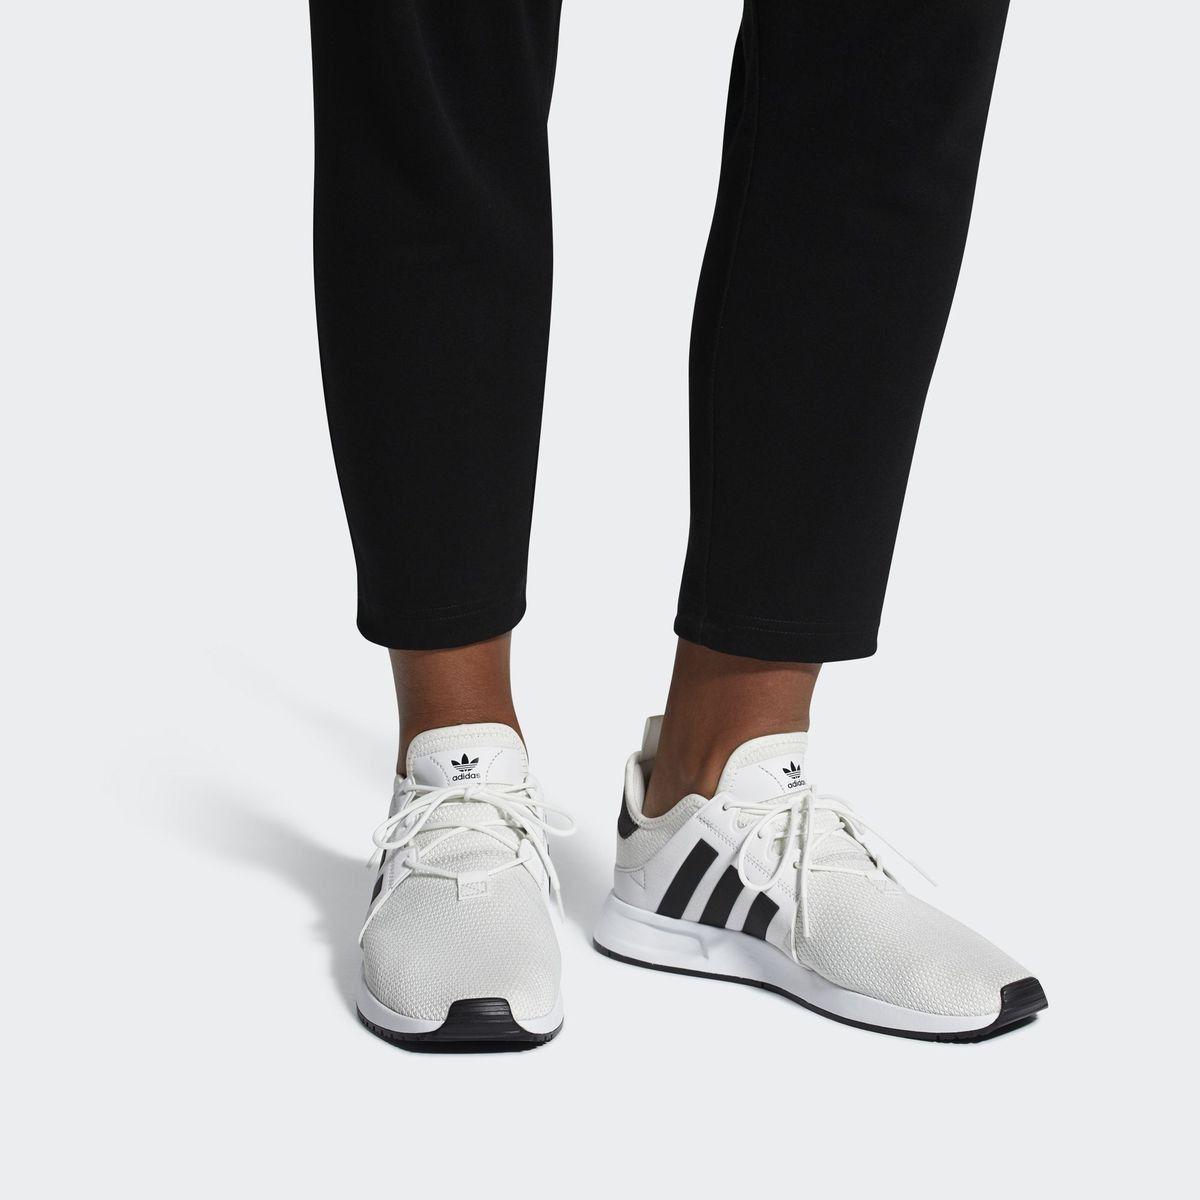 chaussures adidas ado garçon